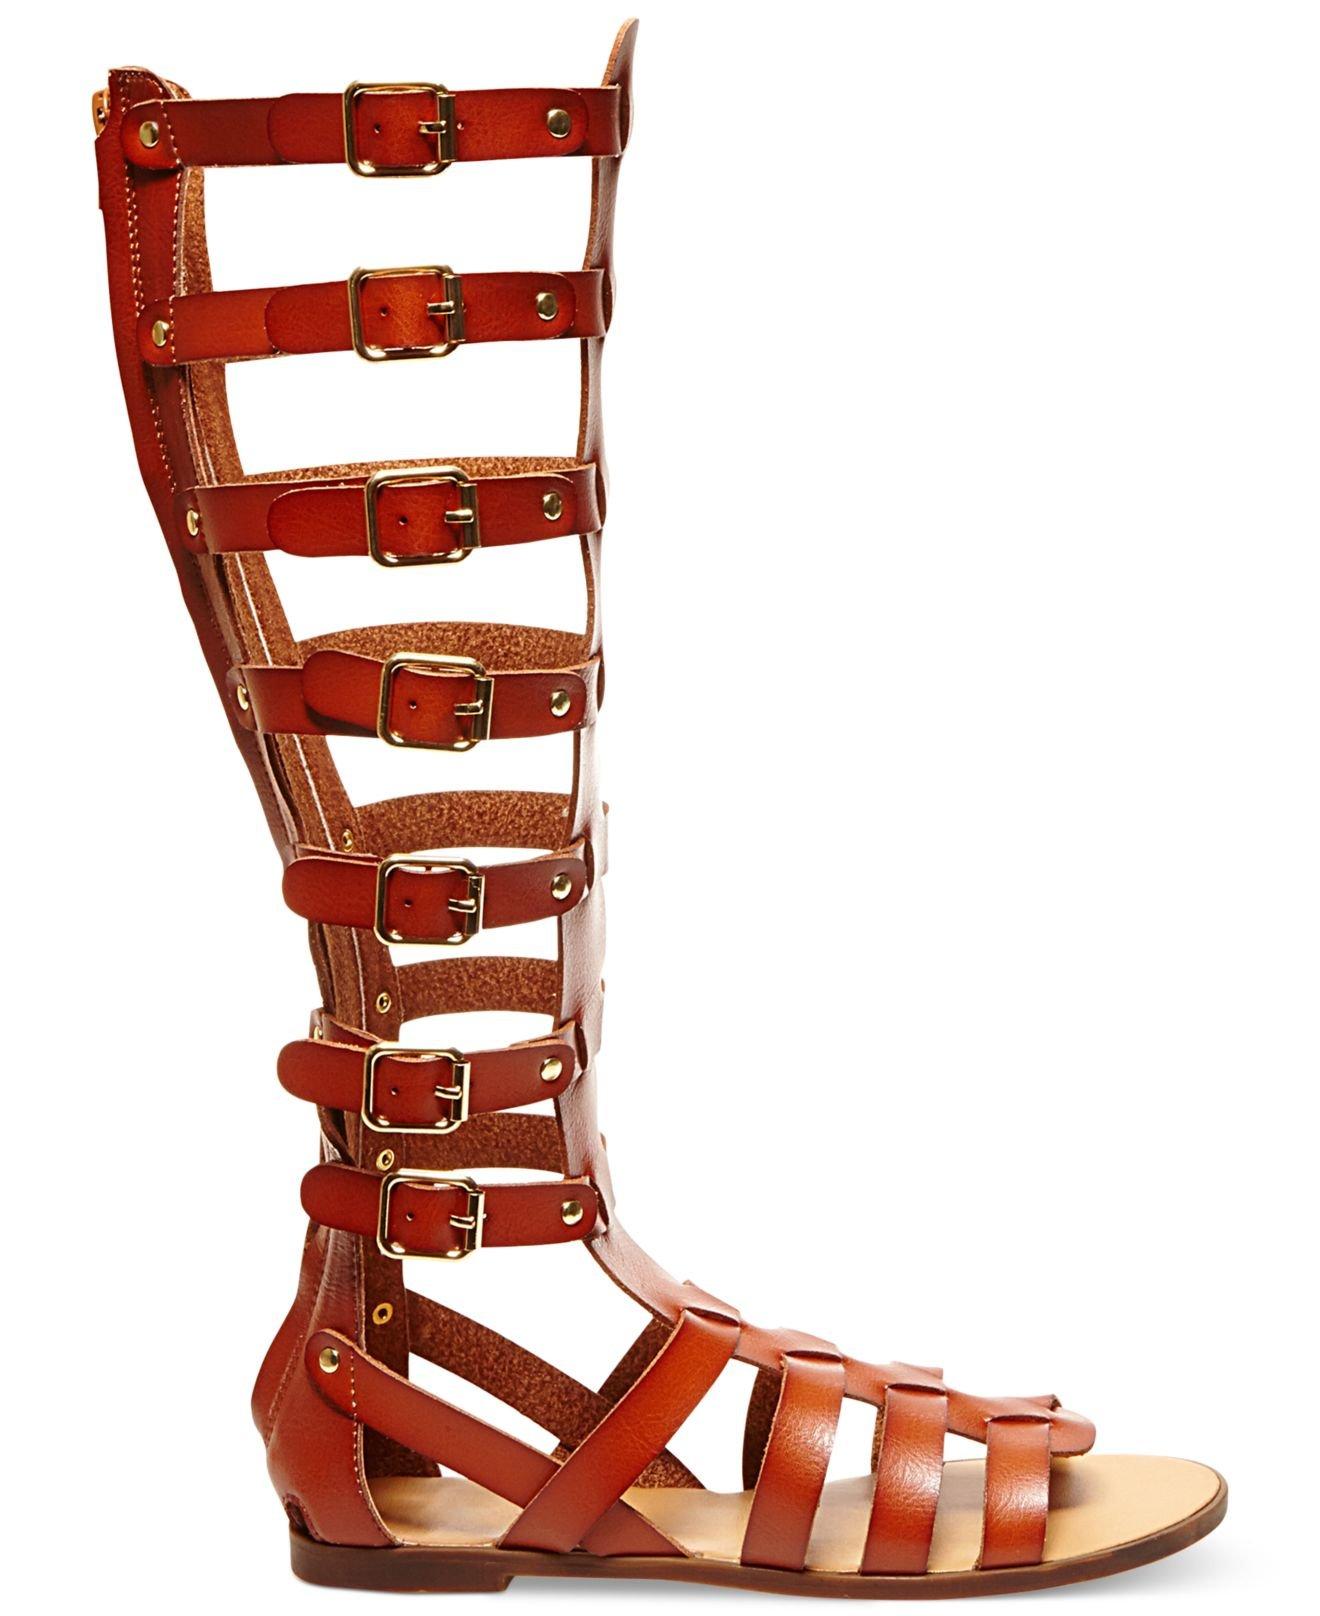 1b801cbedf9e Lyst - Madden Girl Penna Tall Gladiator Sandals in Brown